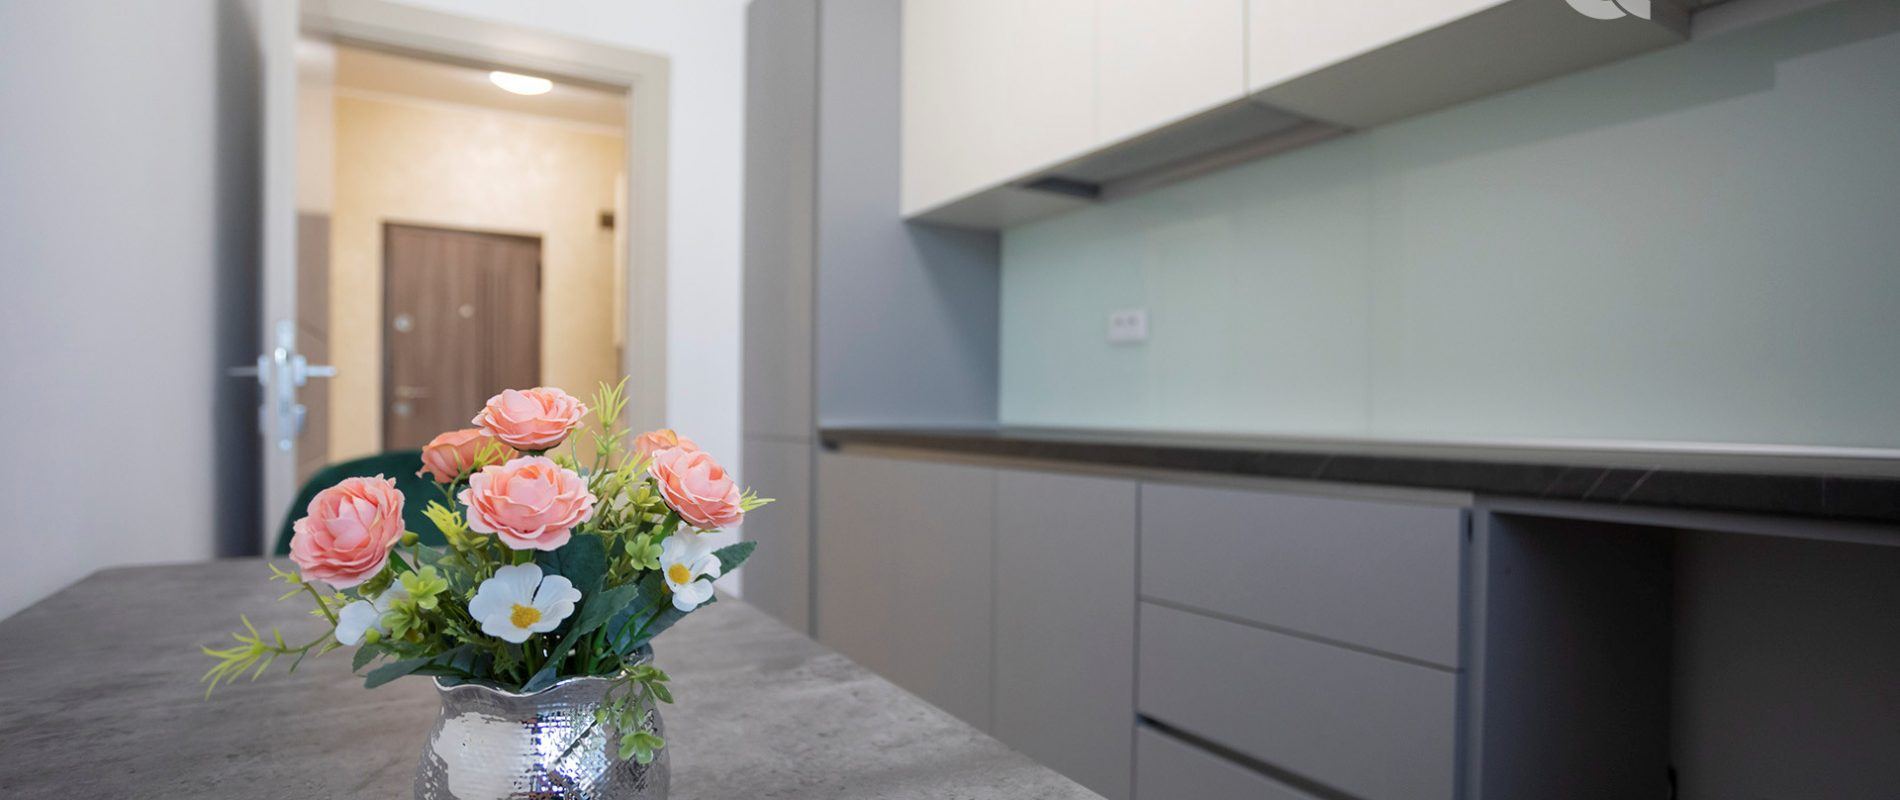 q-residence-apartament-cu-o-camera-mobilier-modern-bucatarie-01